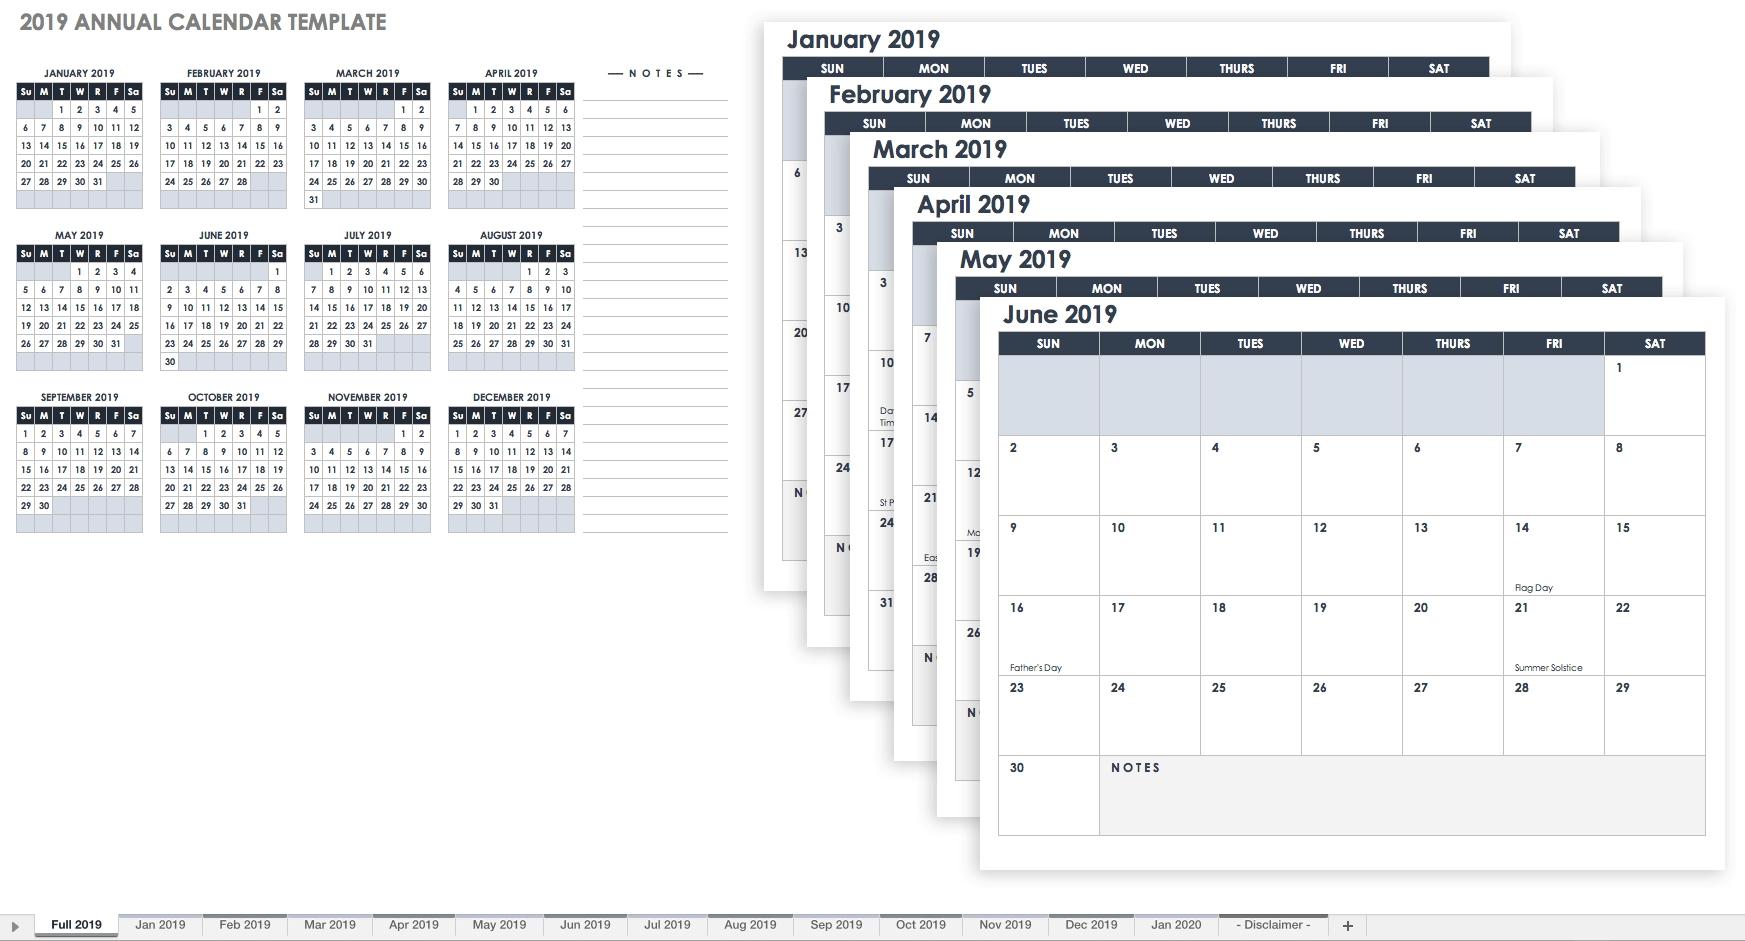 15 Free Monthly Calendar Templates | Smartsheet Calendar 2019 Template Excel